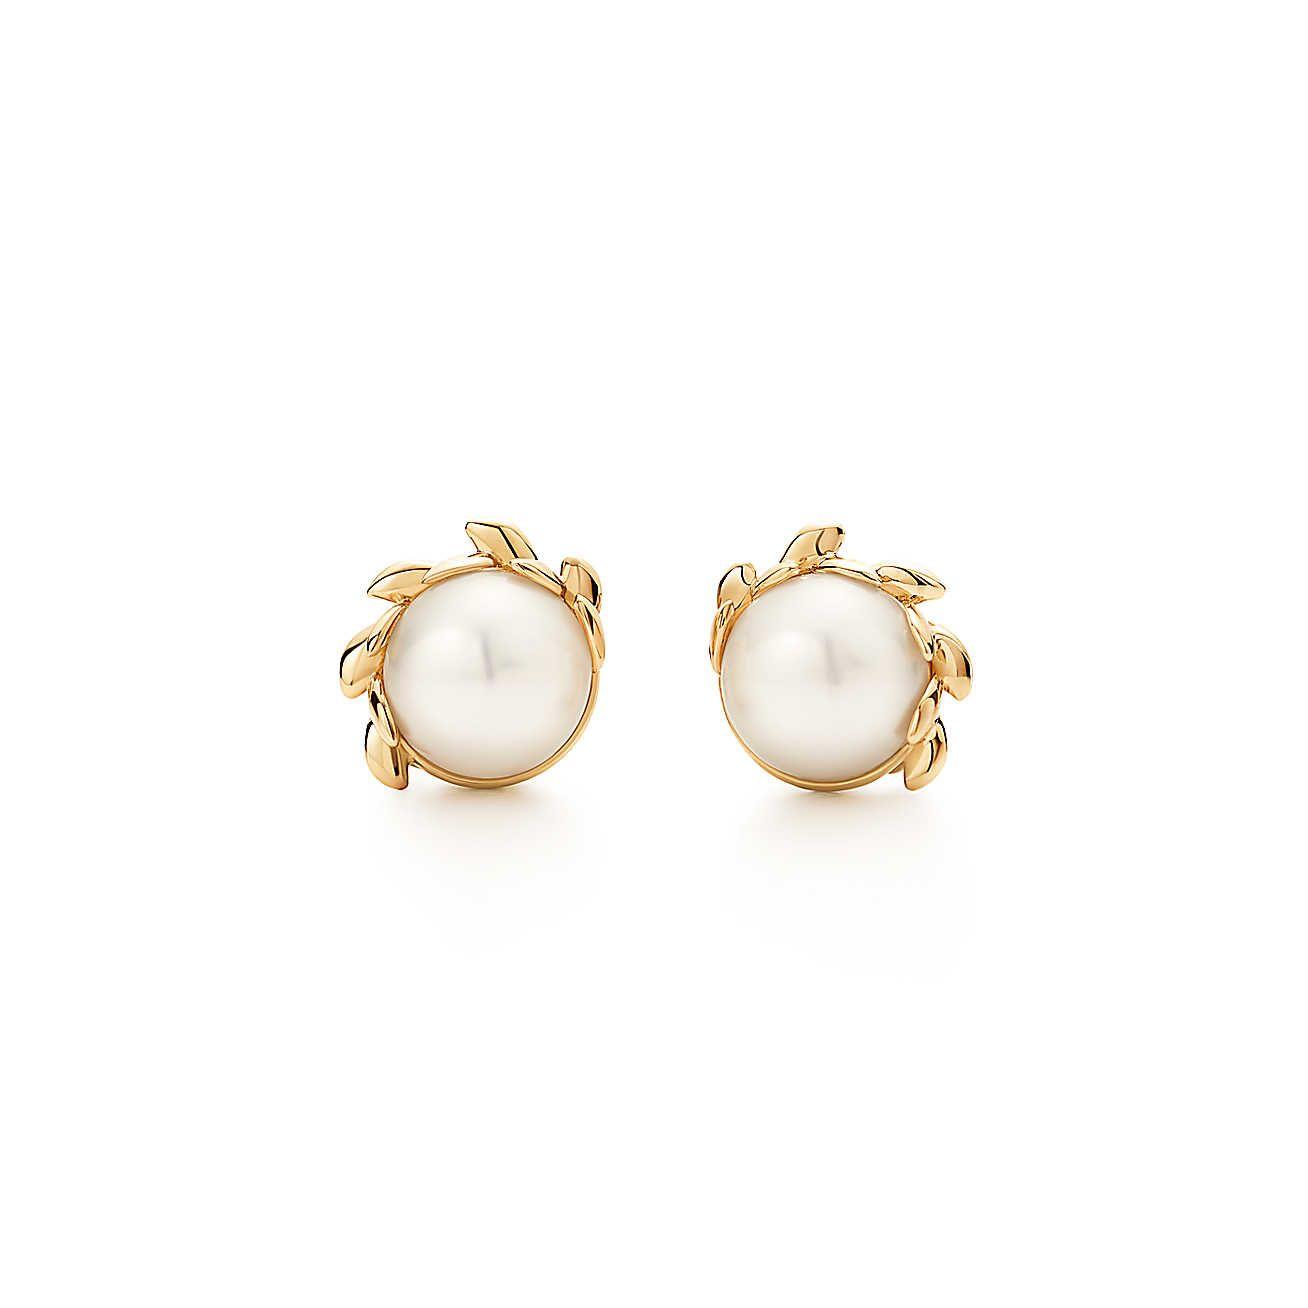 Paloma Pico Olive Leaf Br Pearl Earrings Jewlery In